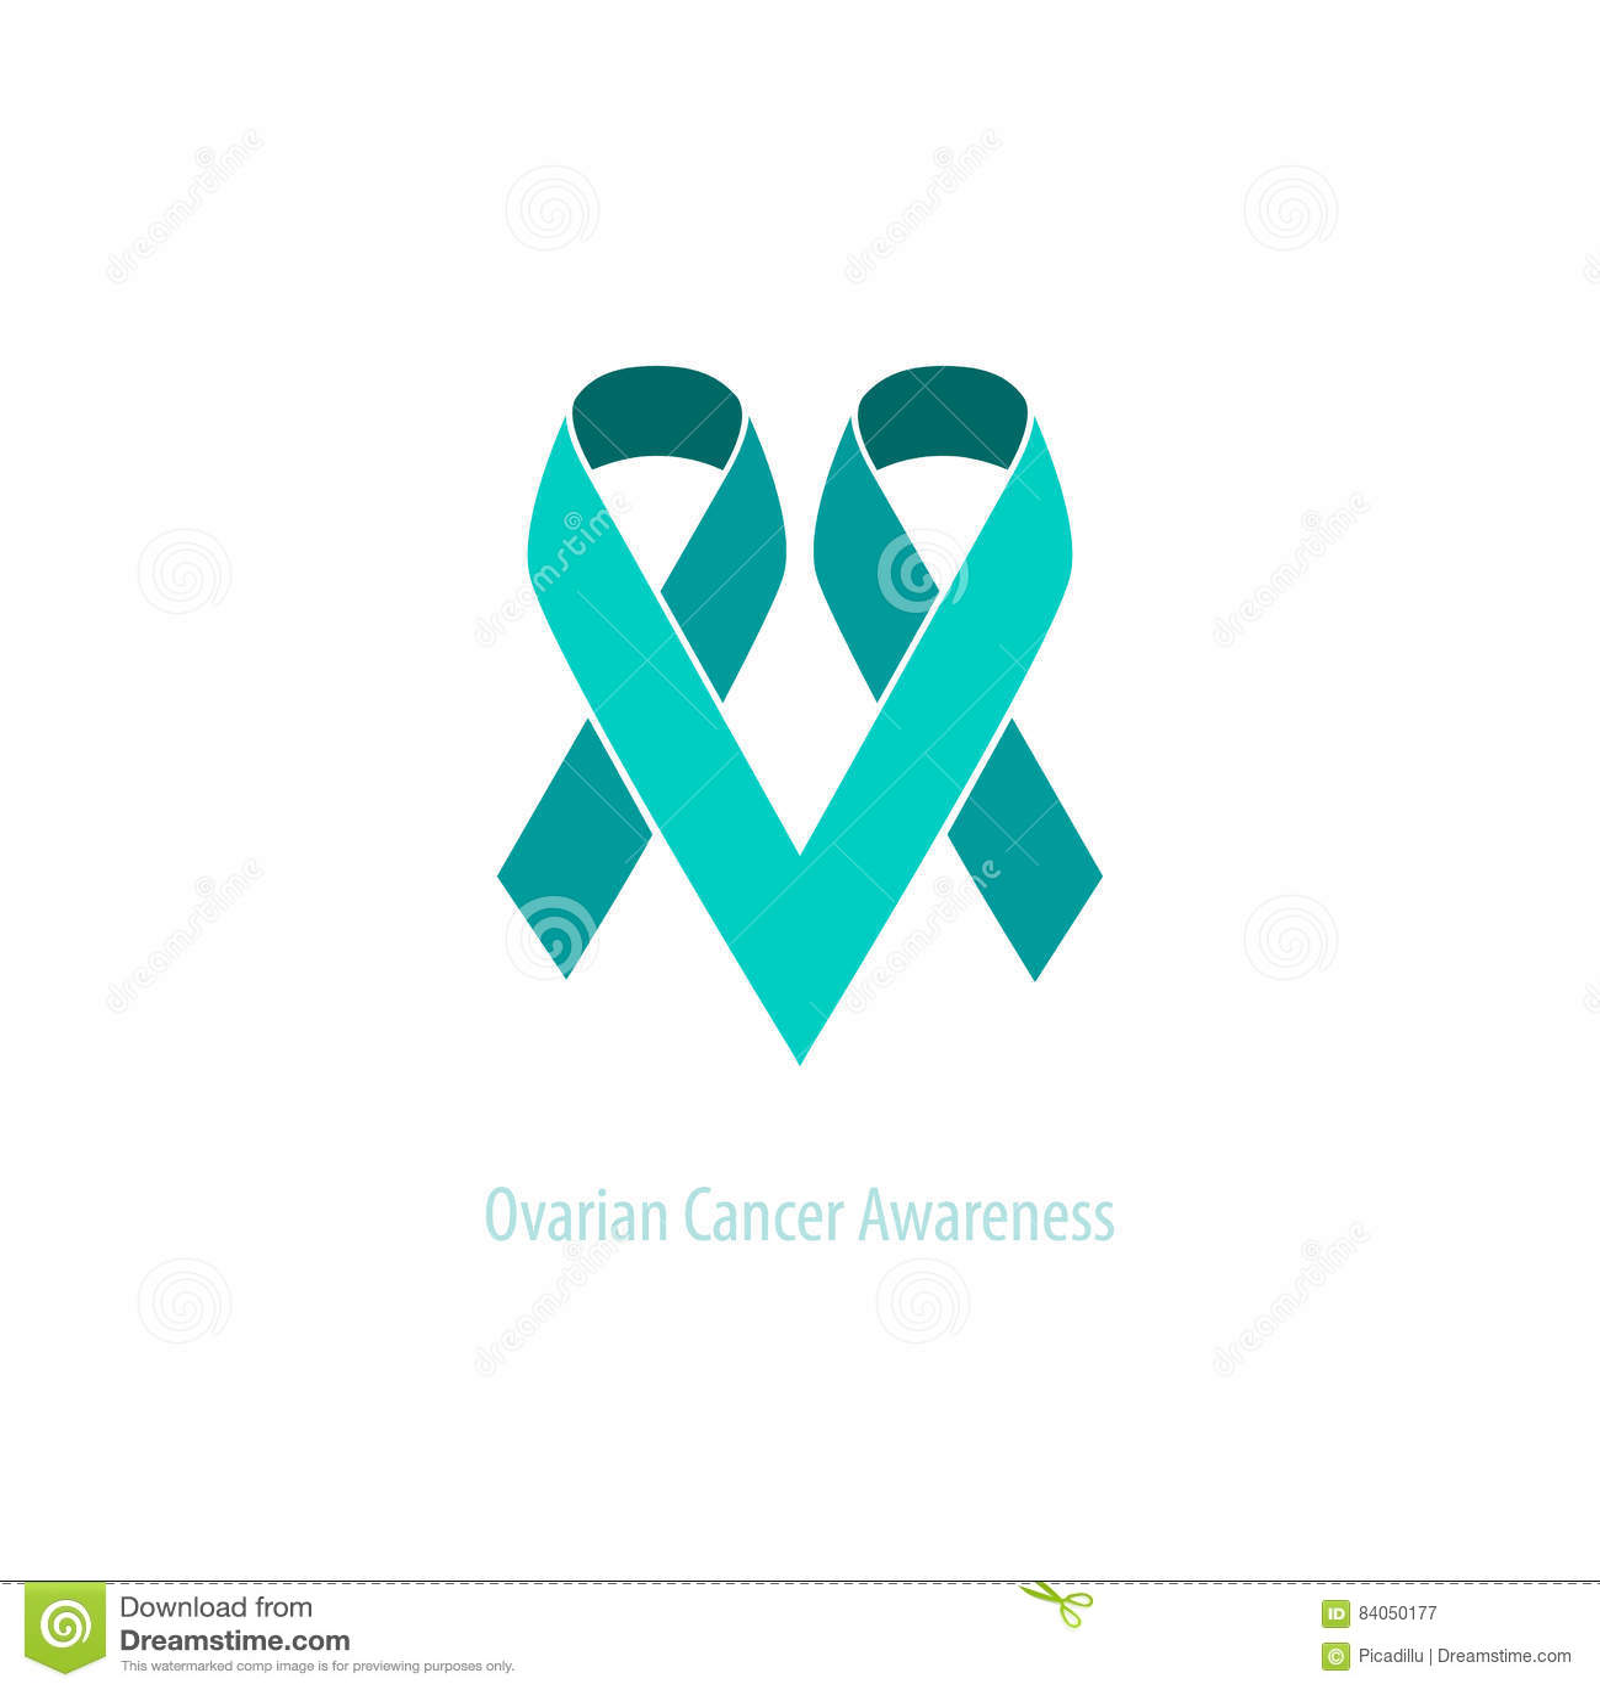 Teal Ribbons Ovarian Cancer Awareness-&Support Herz-Emblem